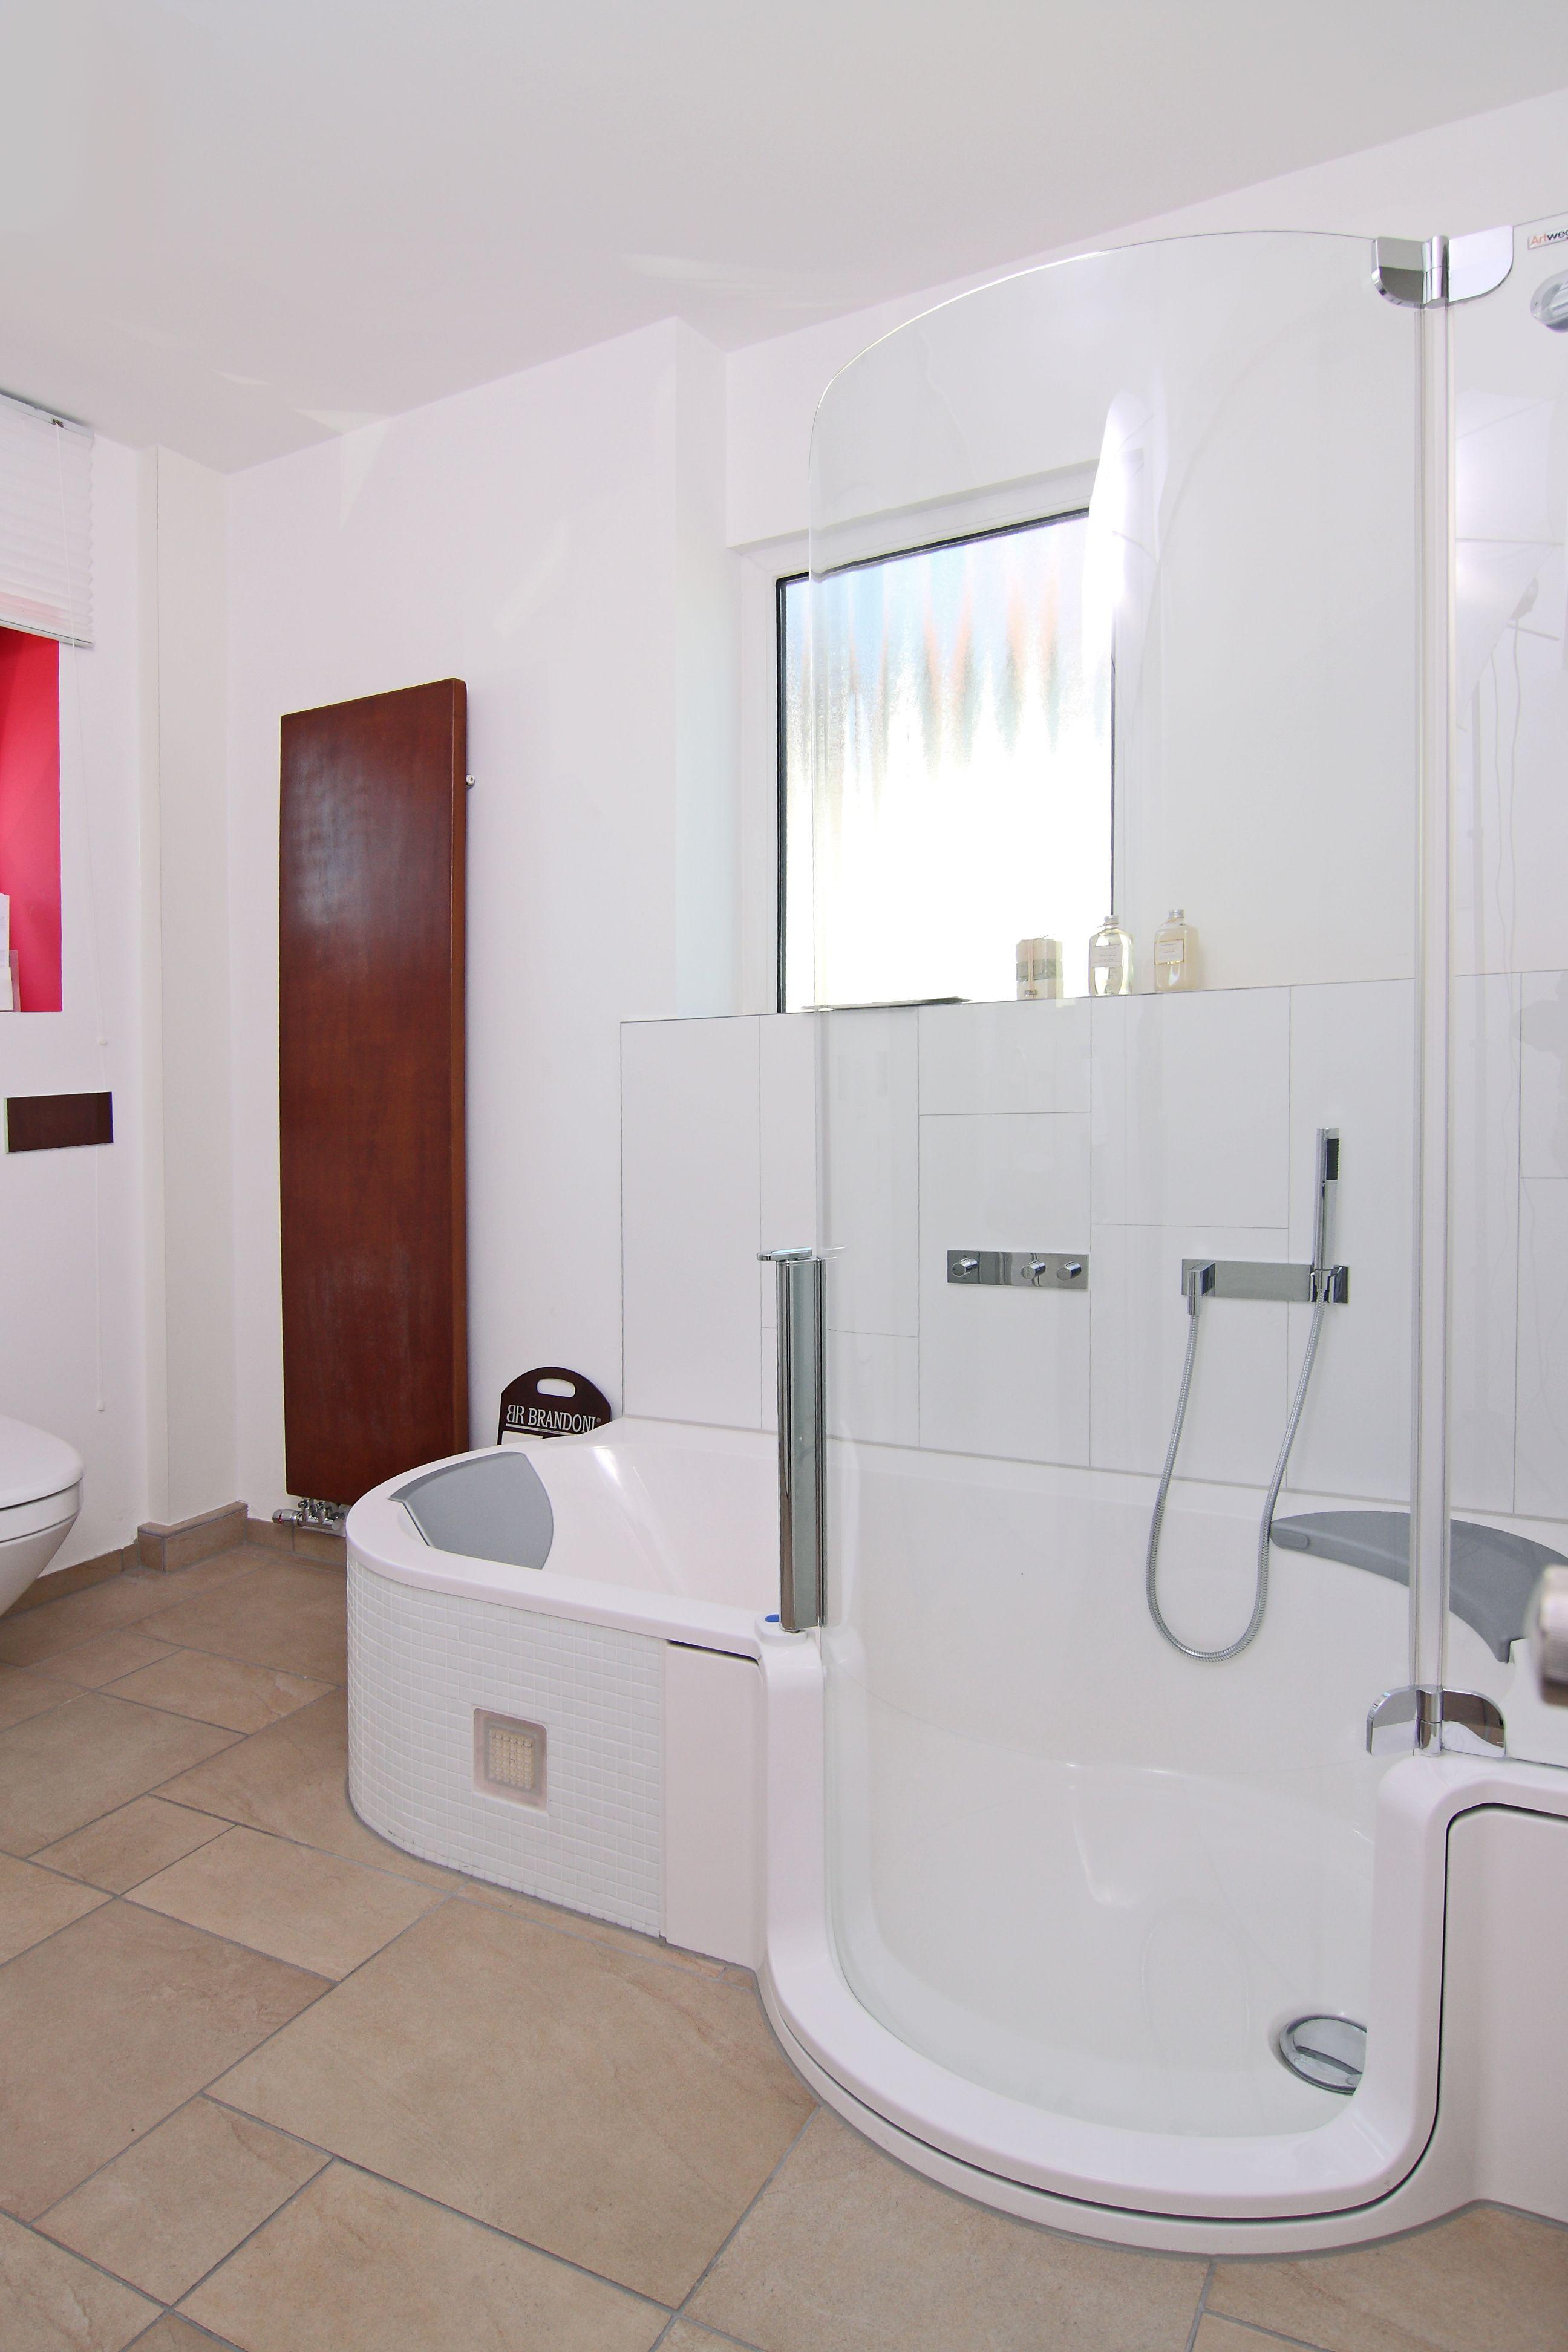 Badezimmer  Health  Handicapped  Bathroom Tub shower combo und Shower tub